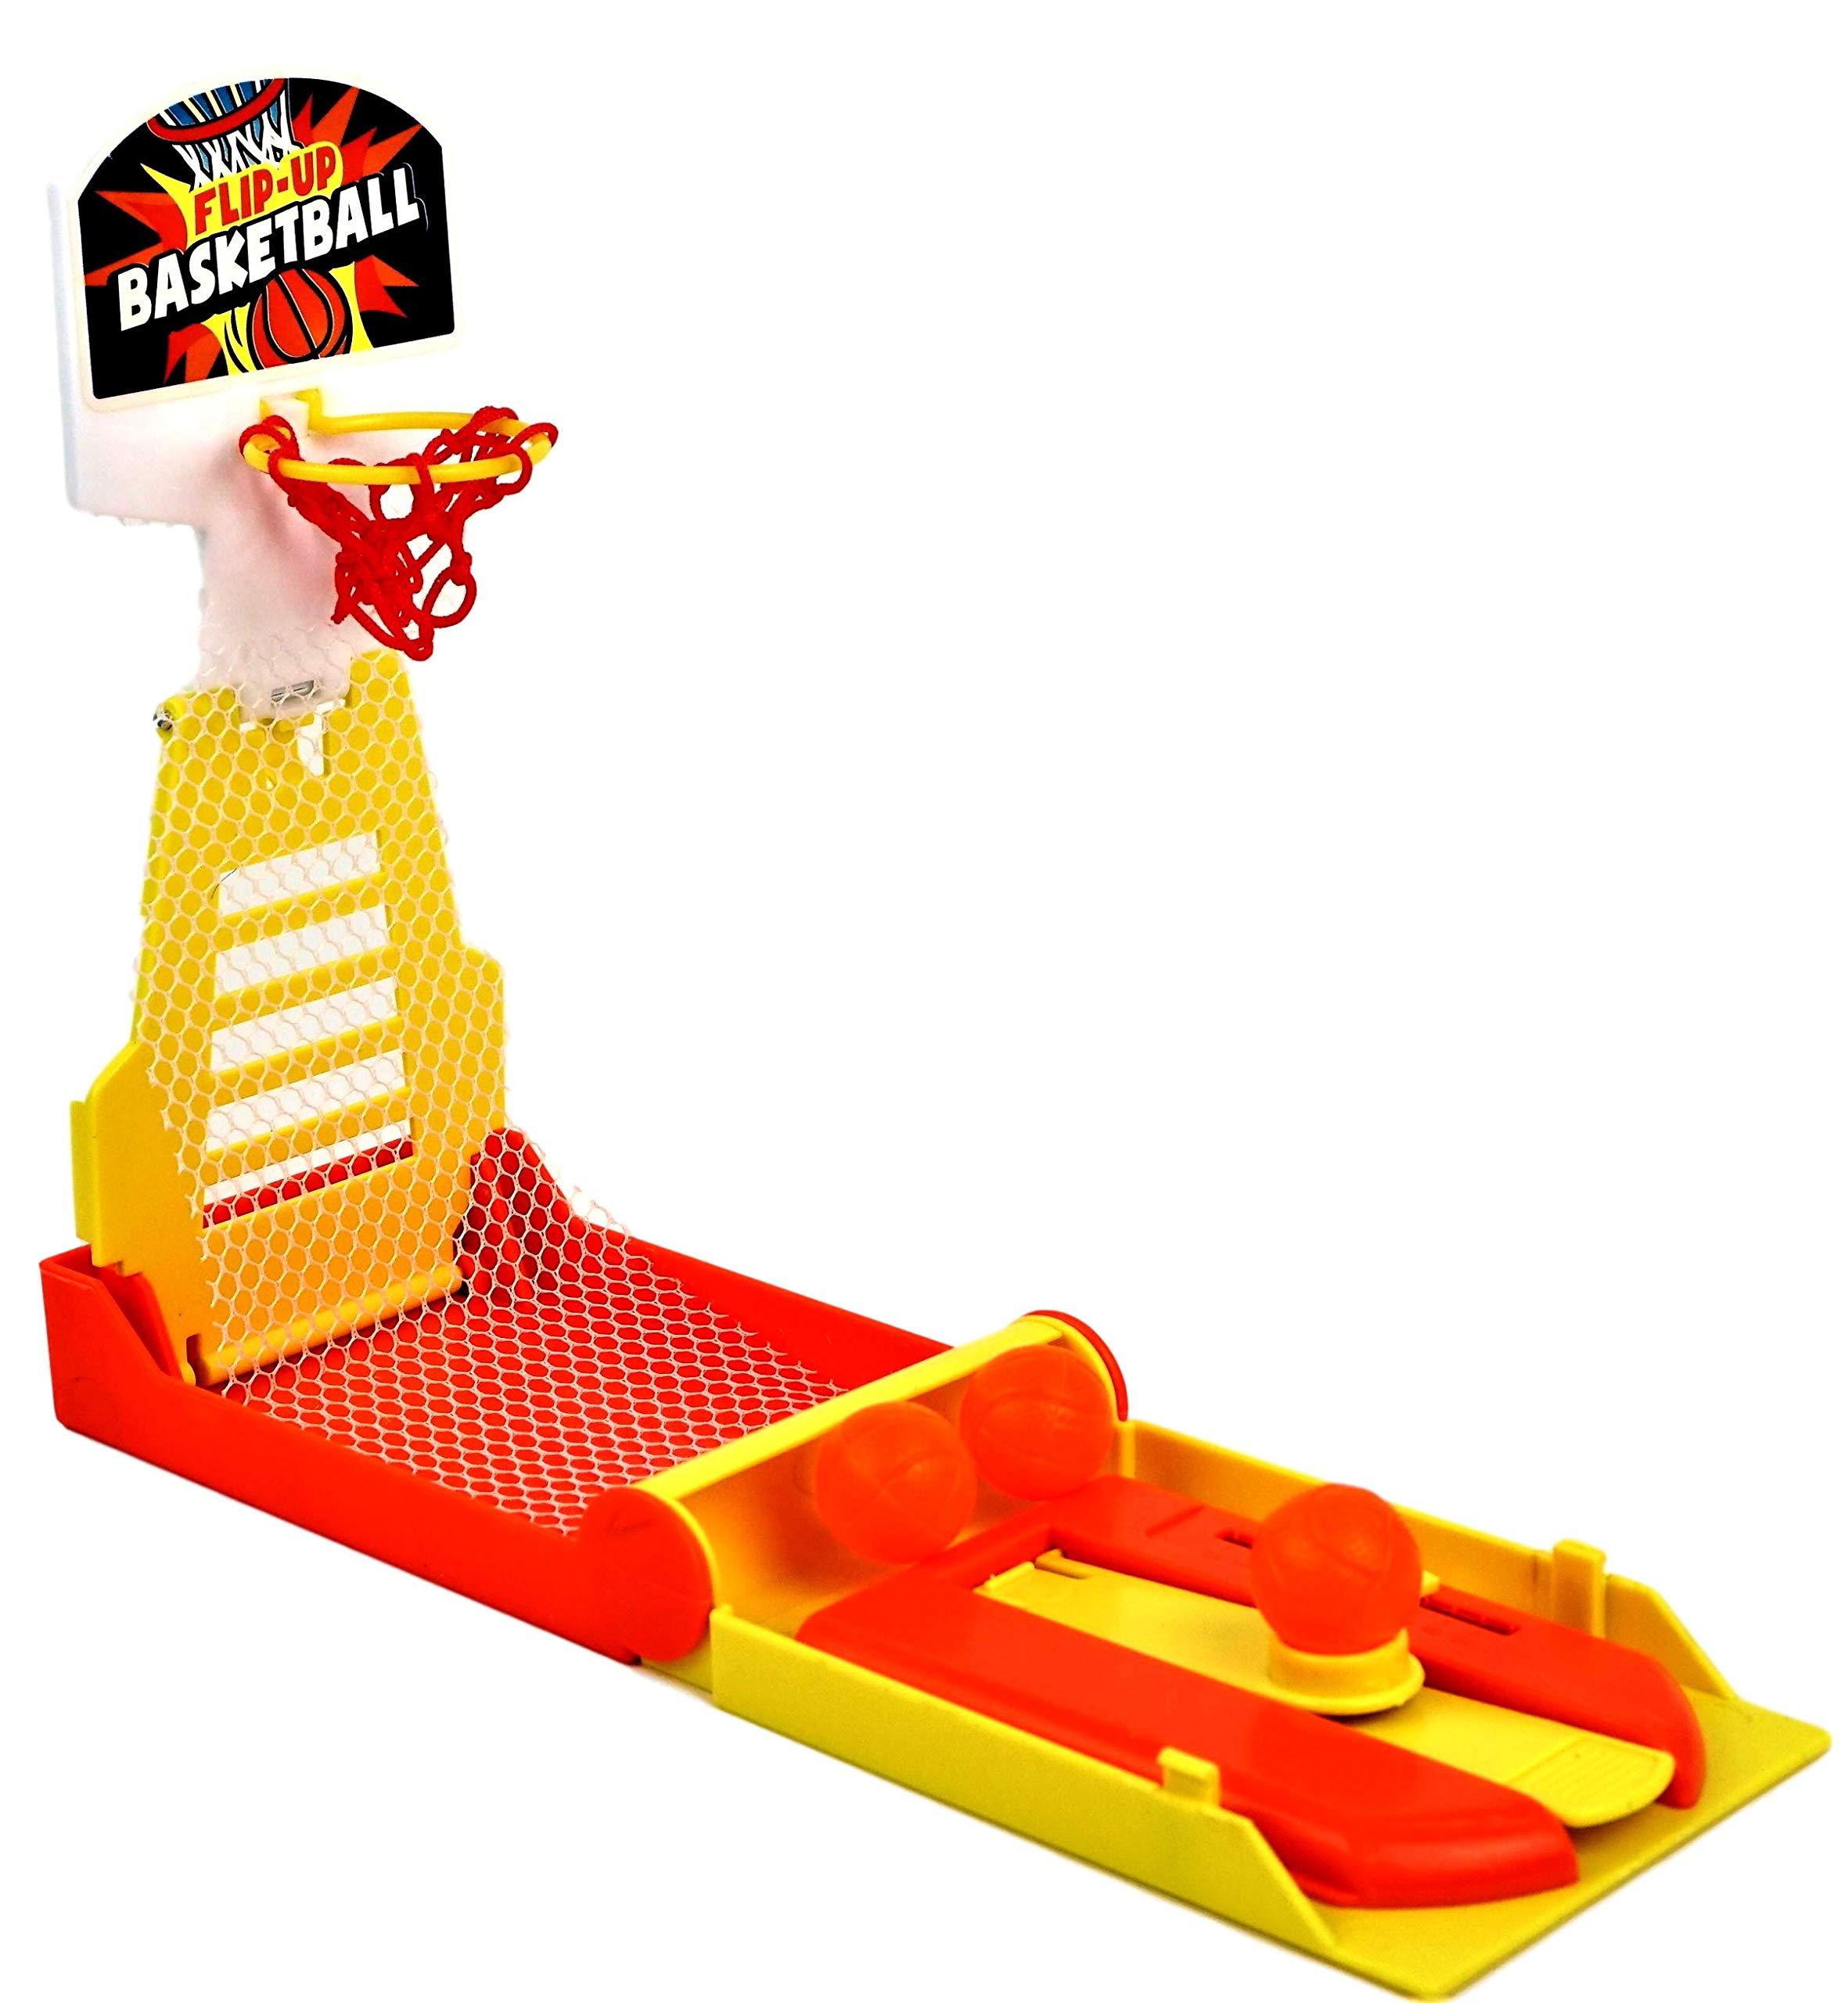 JA-RU Basketball Pocket Travel Game (144 Units) and one Bouncy Ball Item #3255-144p by JA-RU (Image #3)